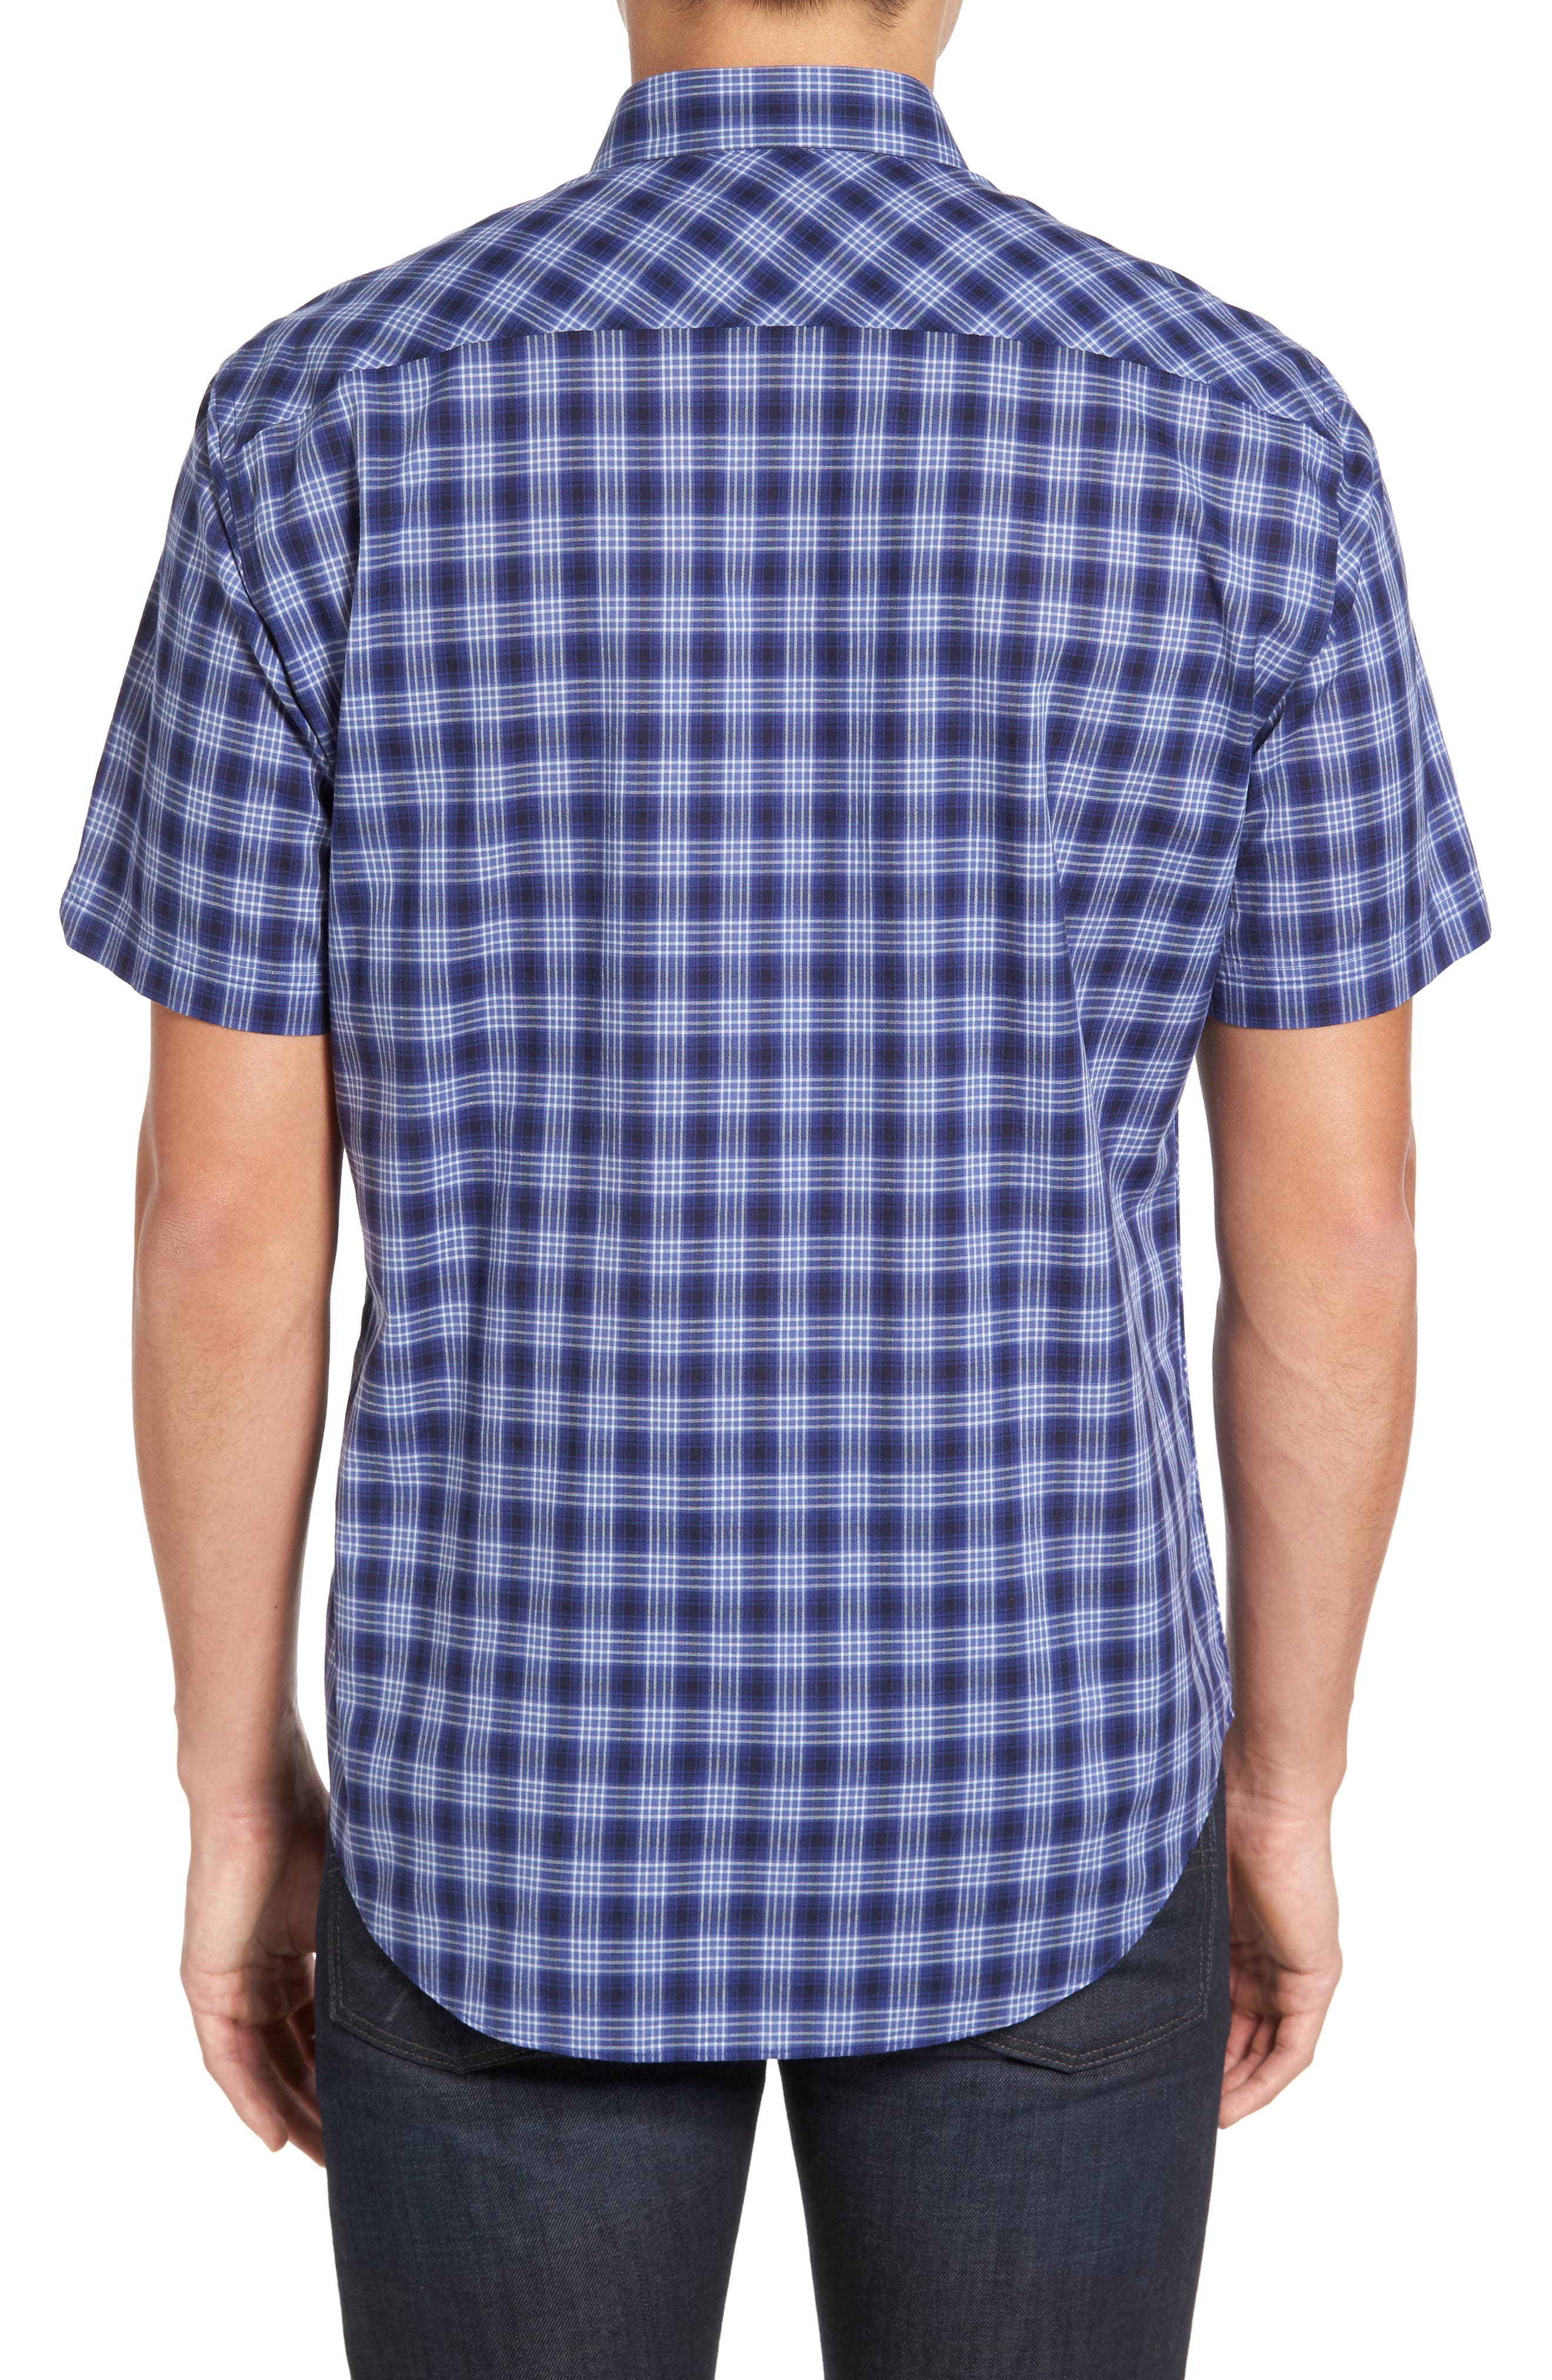 Medina Slim Fit Plaid Sport Shirt,                             Alternate thumbnail 2, color,                             Pacific